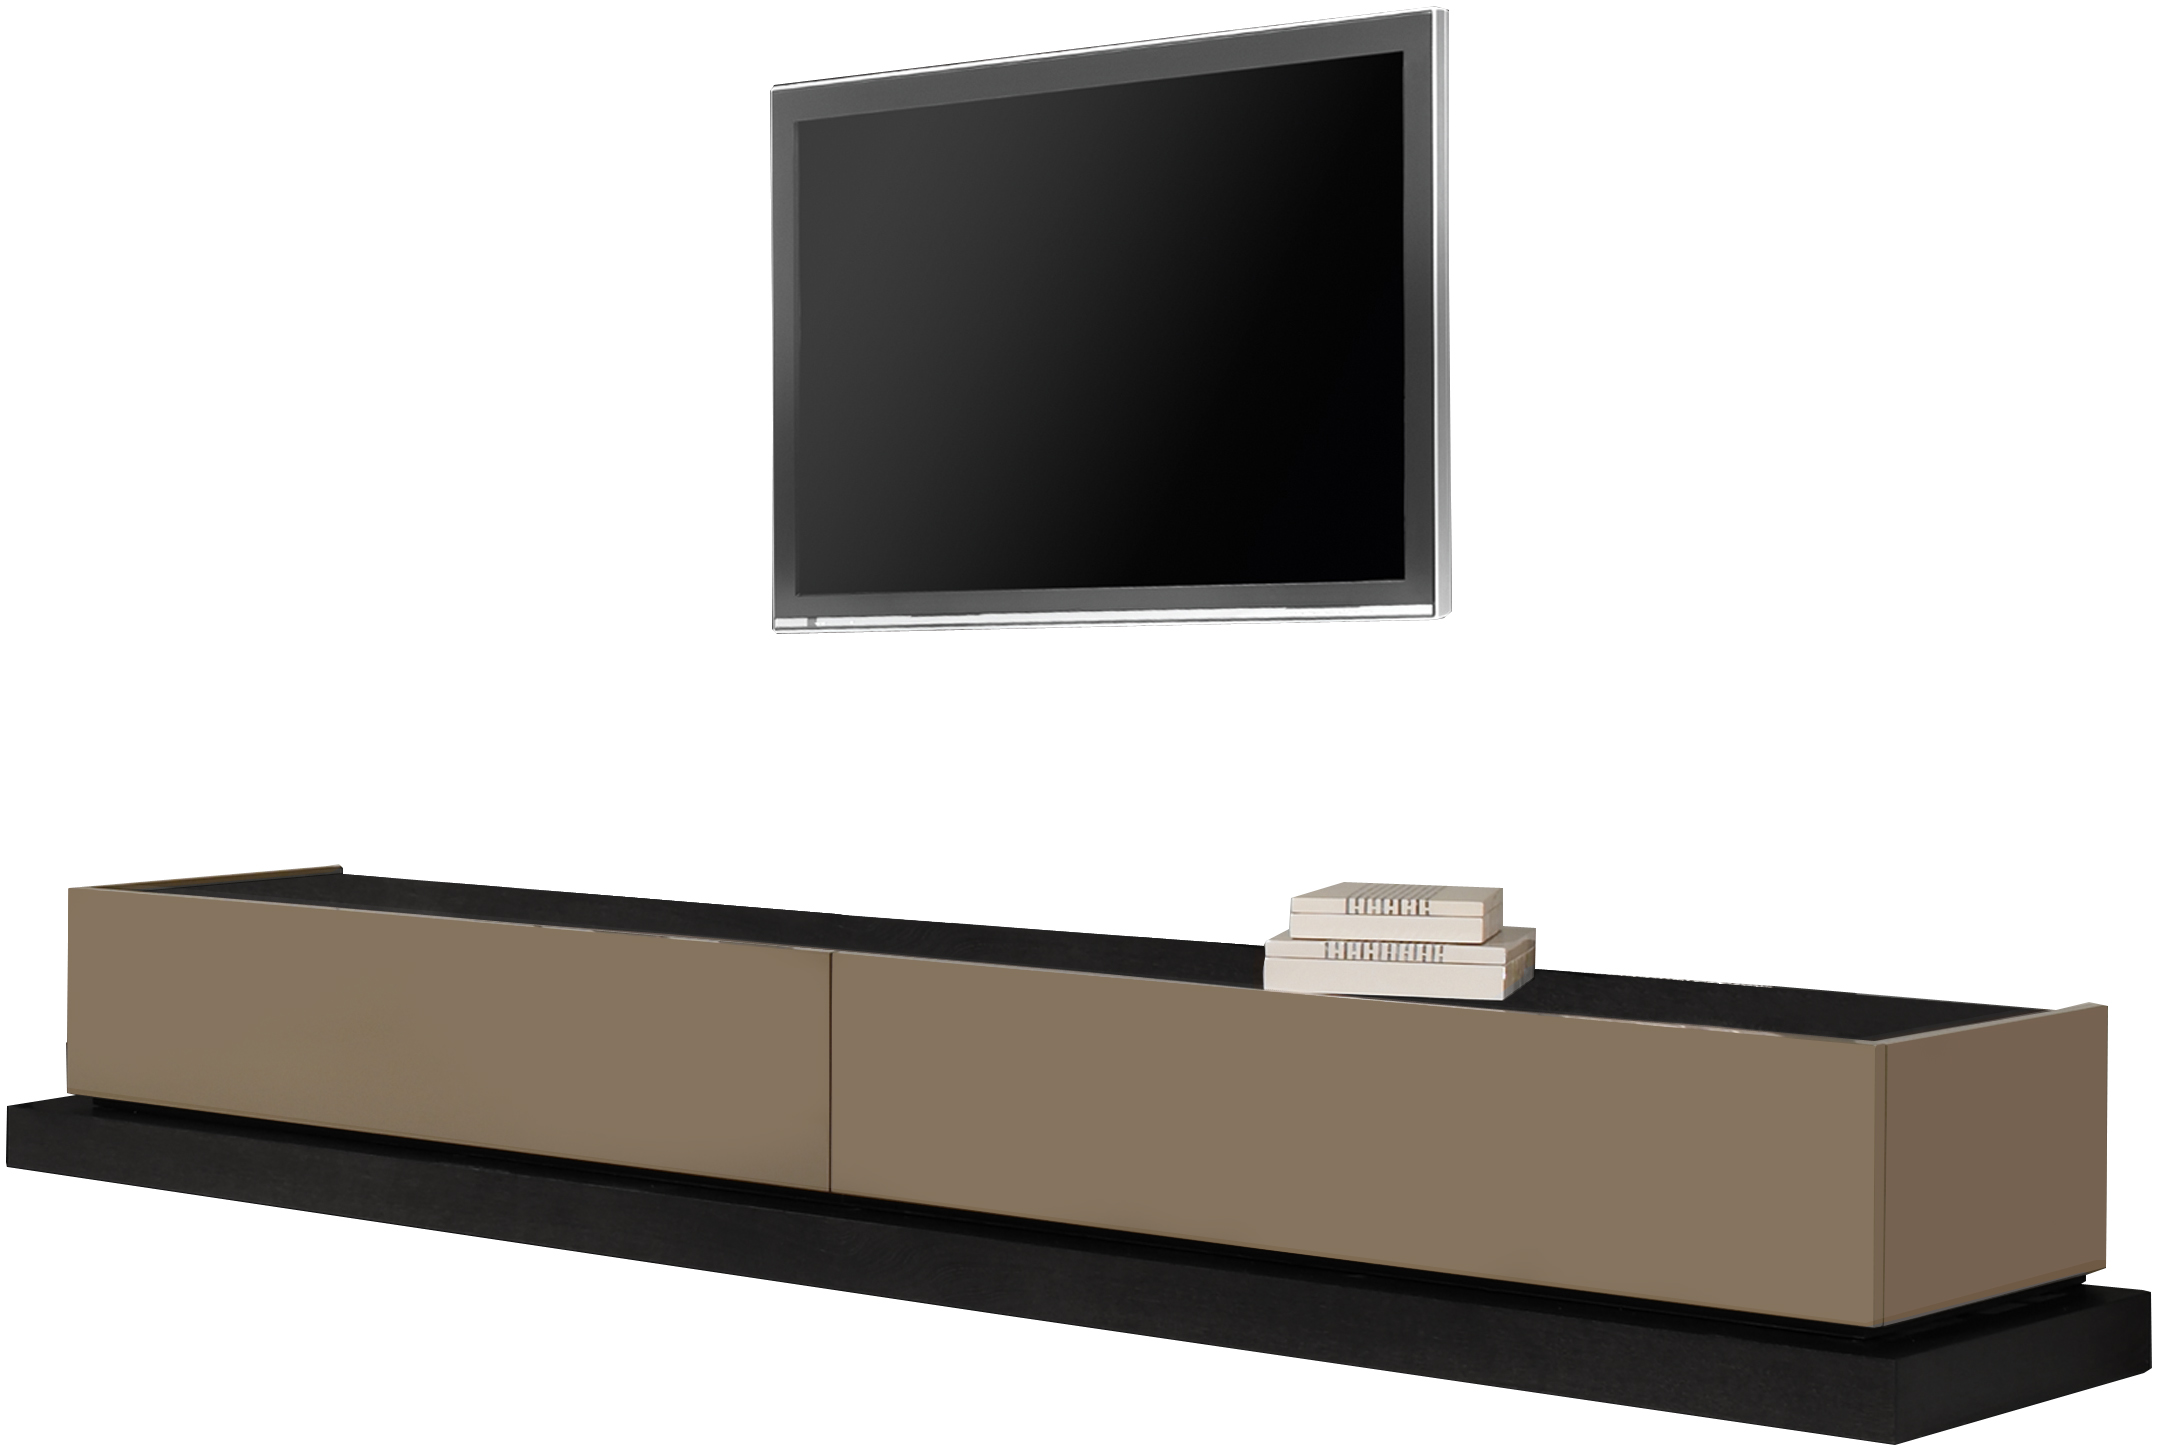 tiroir guide d 39 achat. Black Bedroom Furniture Sets. Home Design Ideas